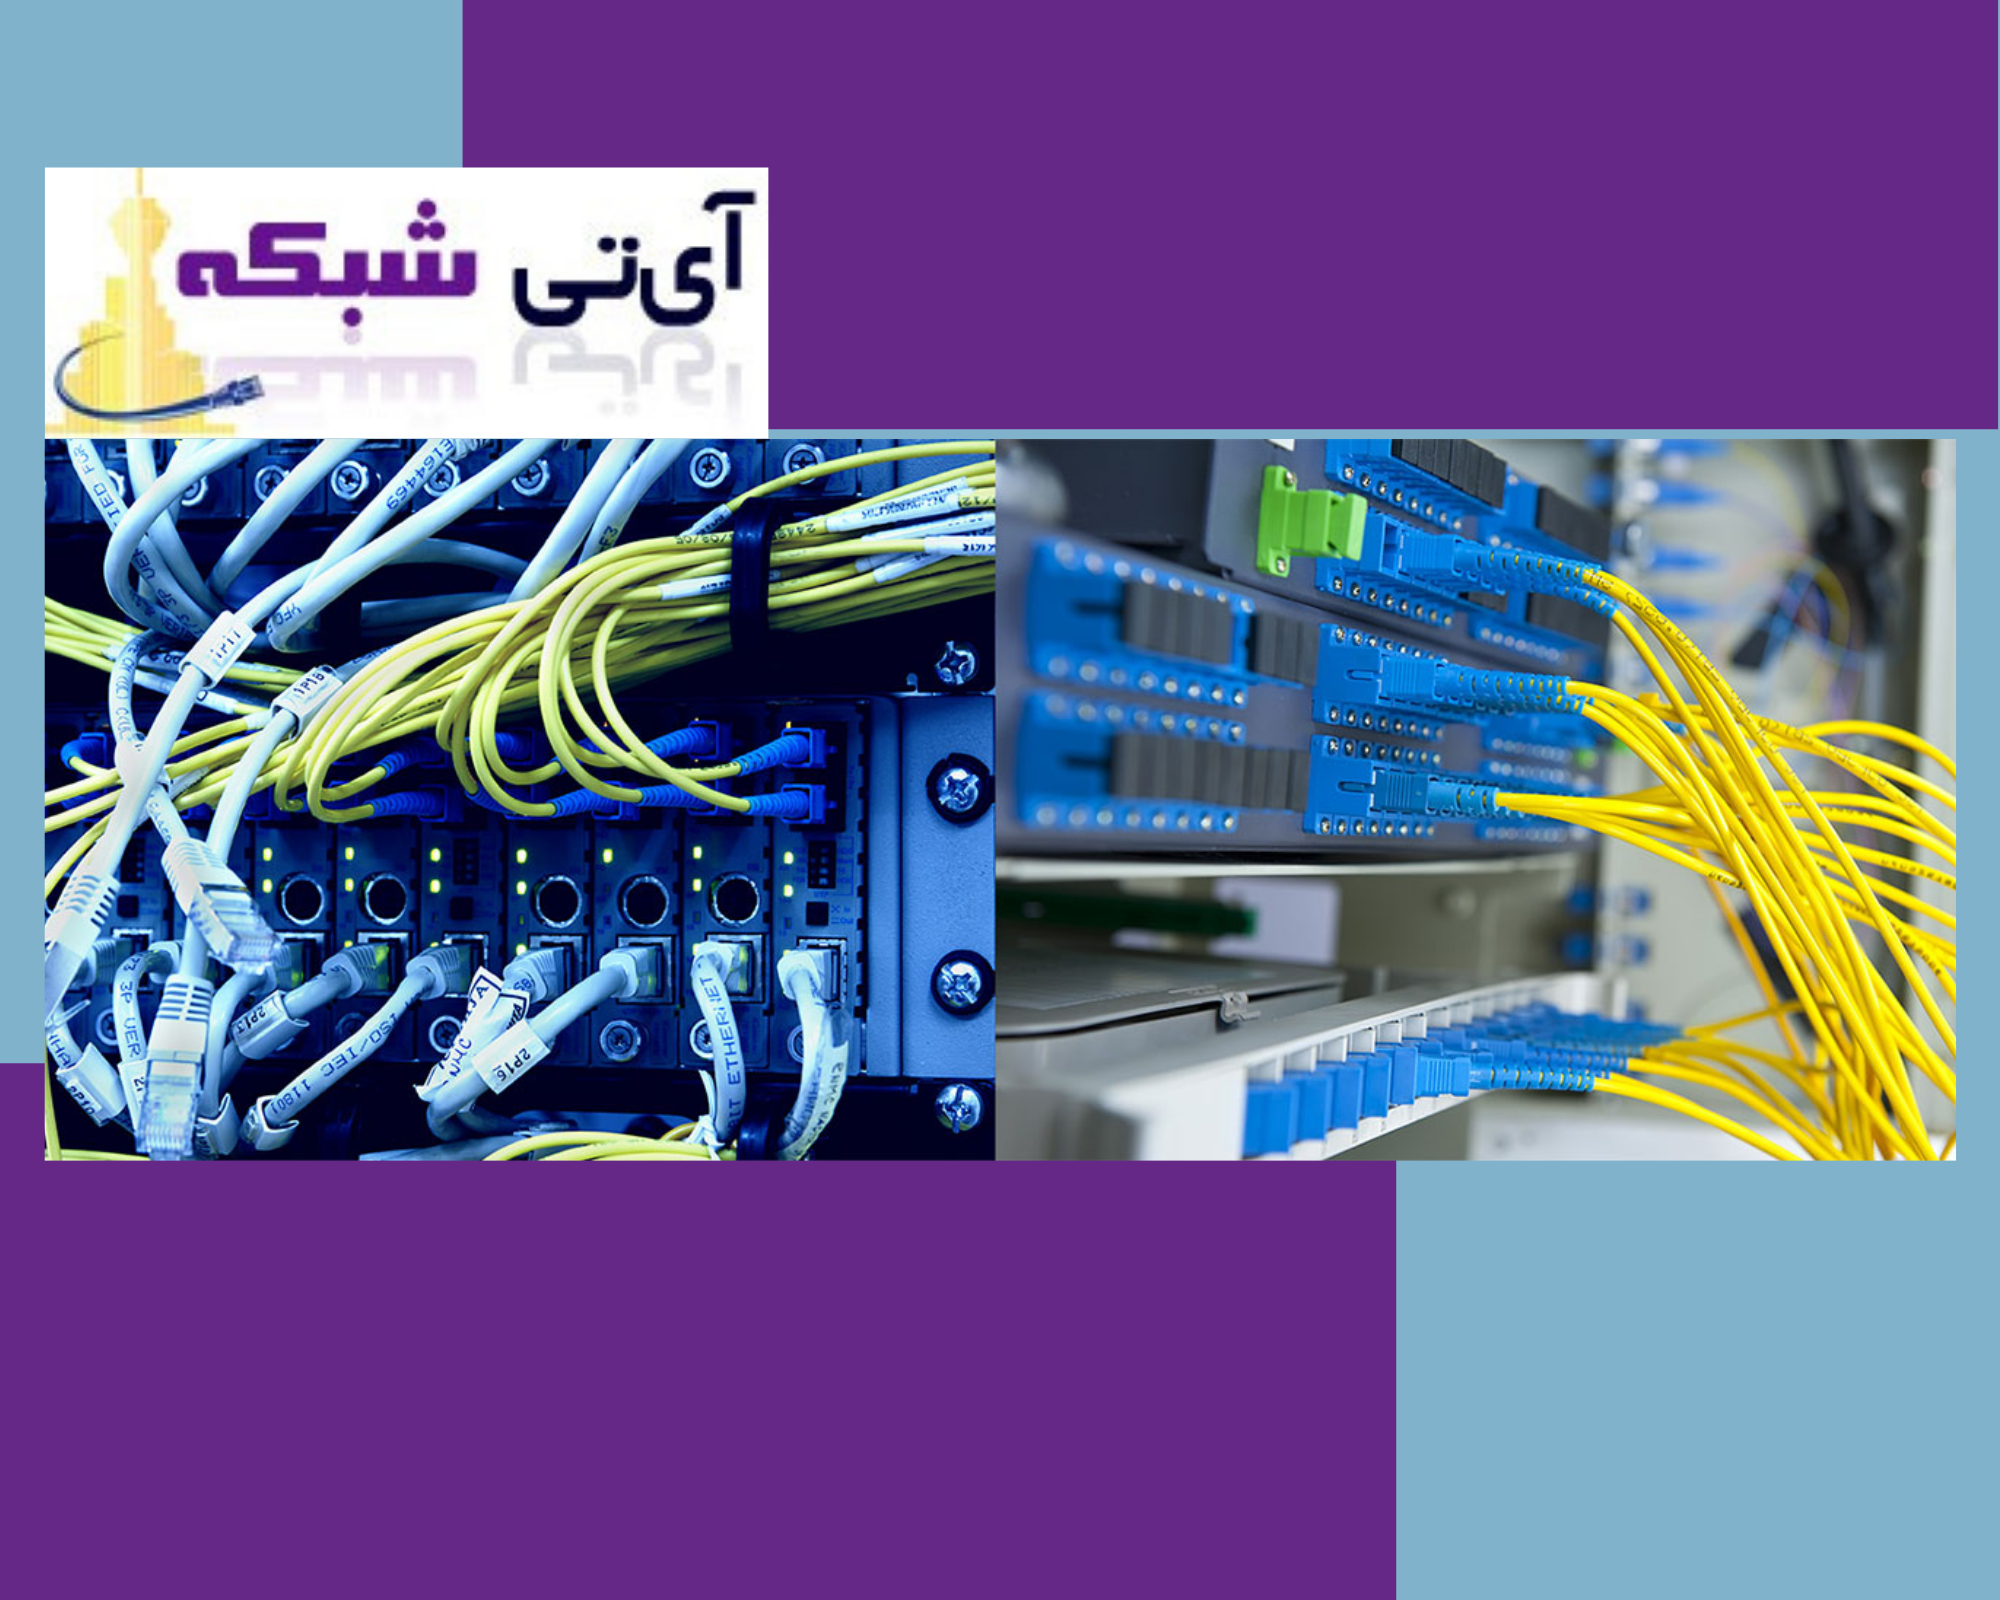 کابل - کشی - ای - تی - شبکه